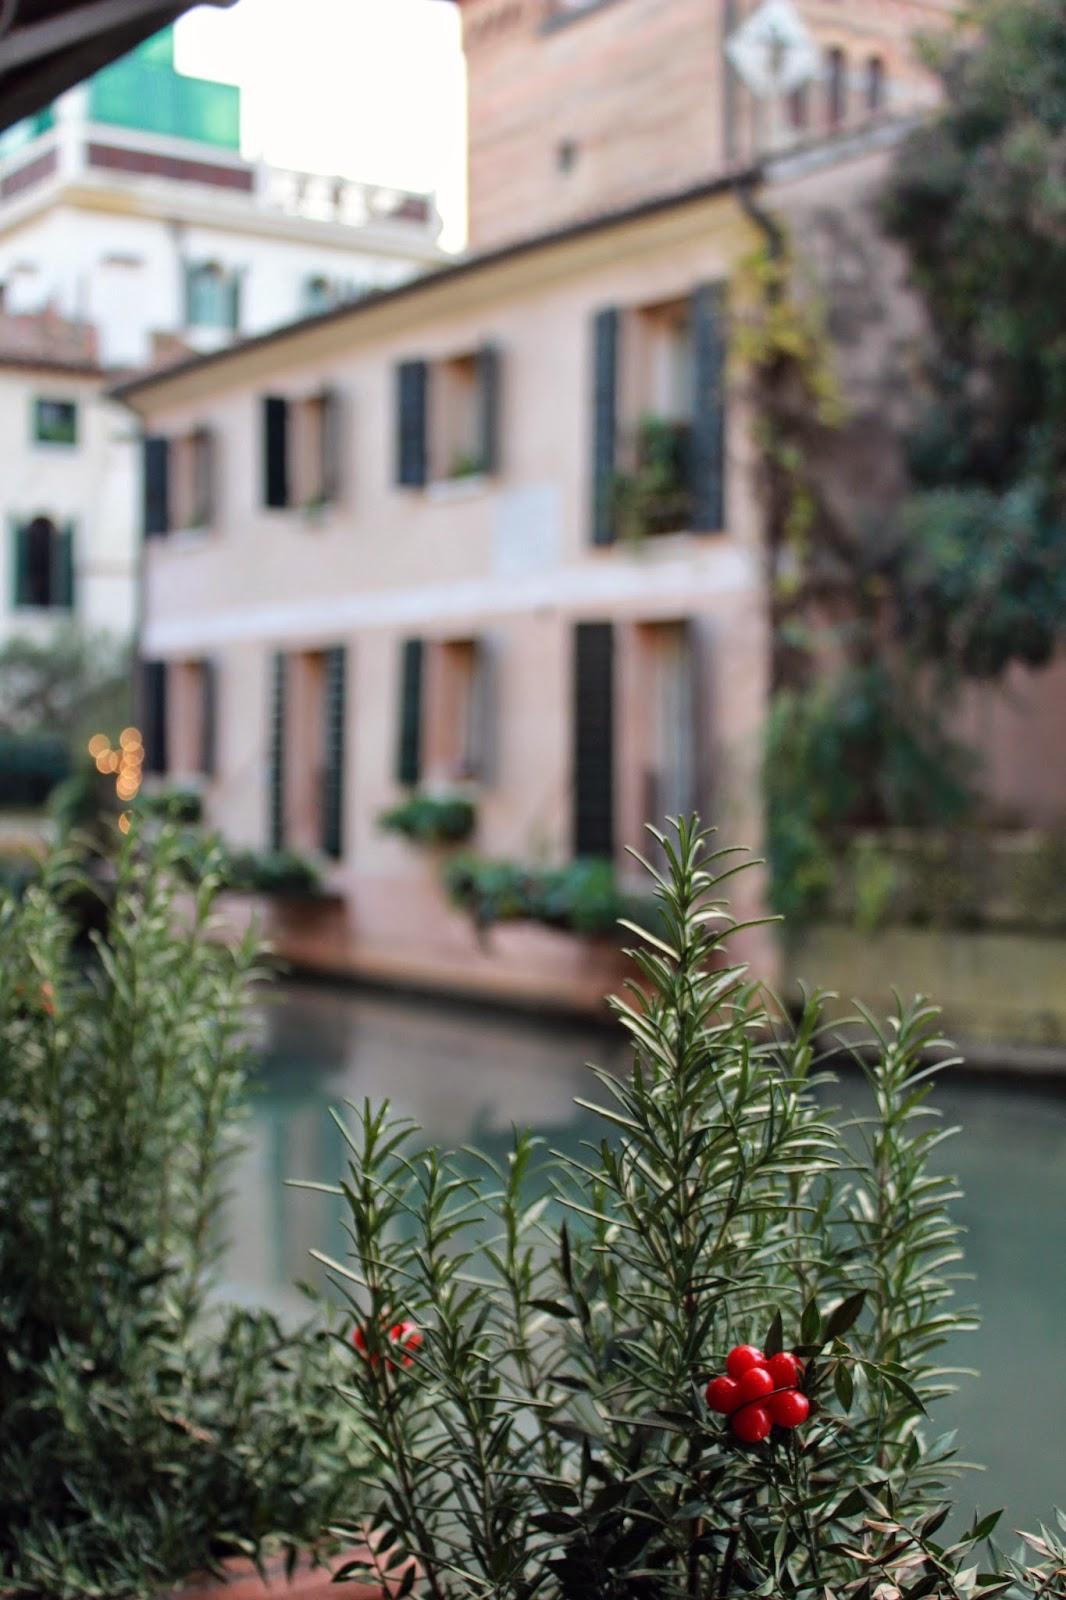 Eniwhere Fashion - Treviso